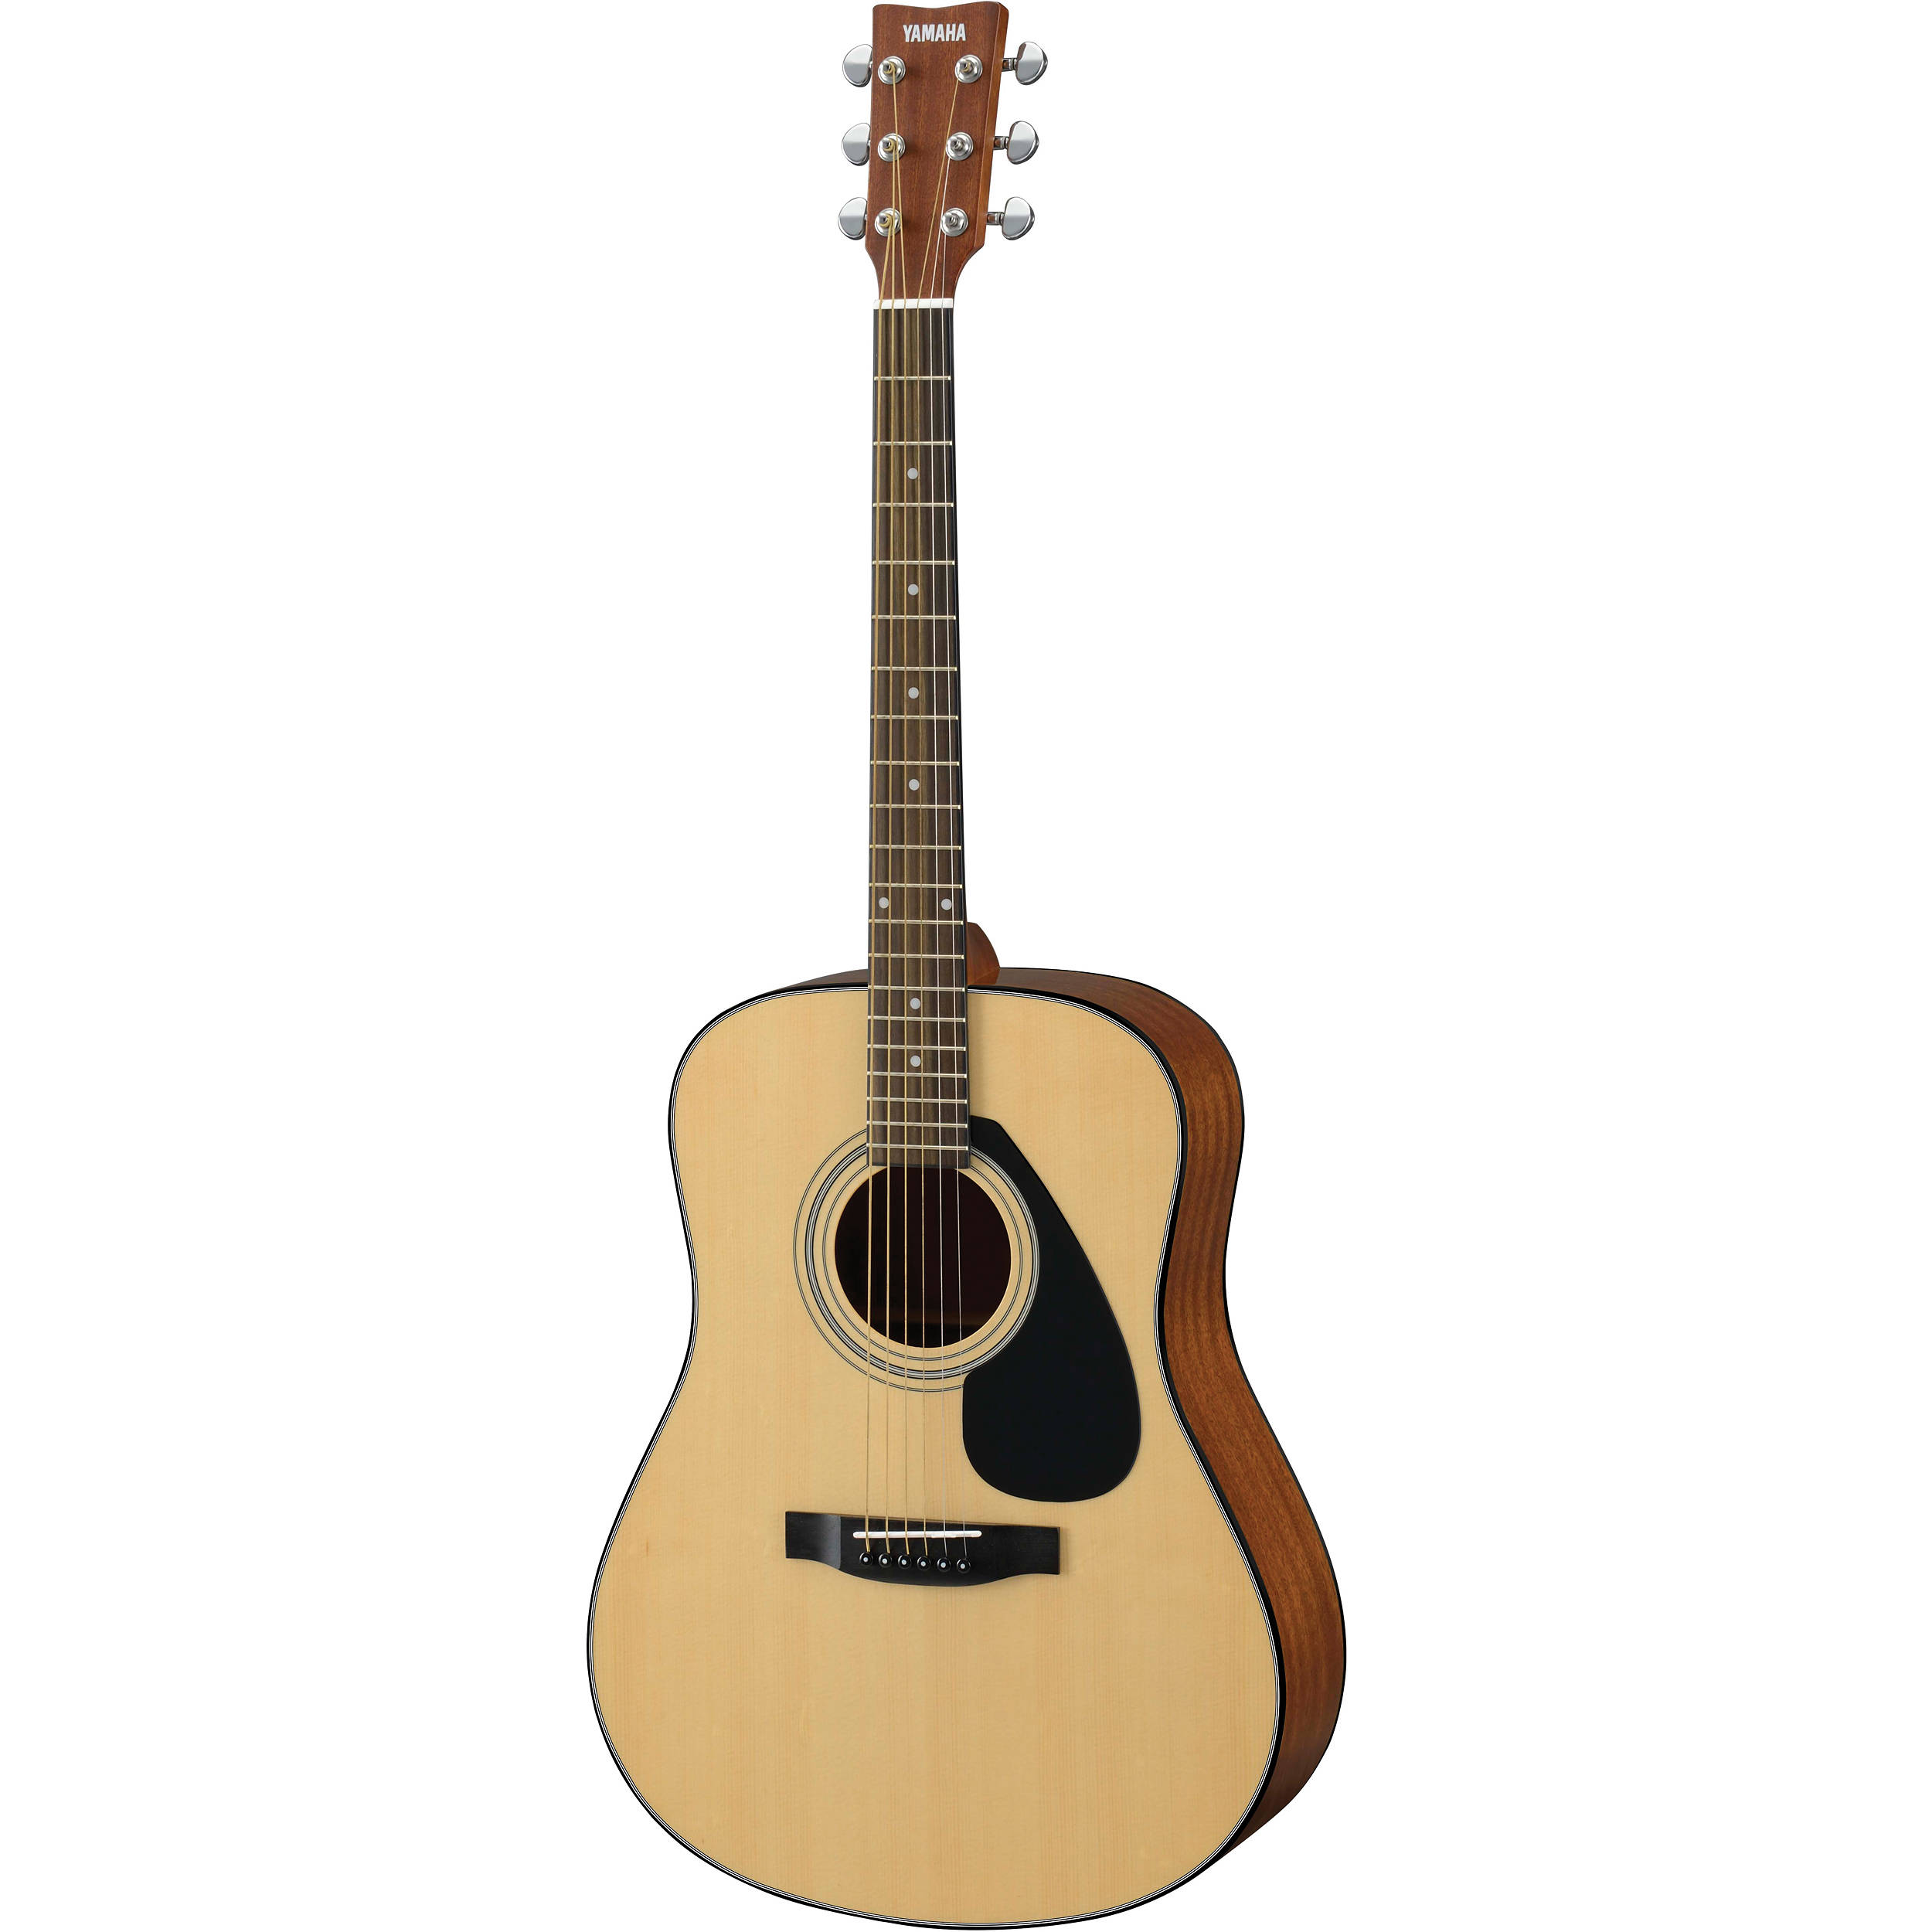 Yamaha yamaha f325d acoustic guitar natural f325d b h photo for Where are yamaha guitars made